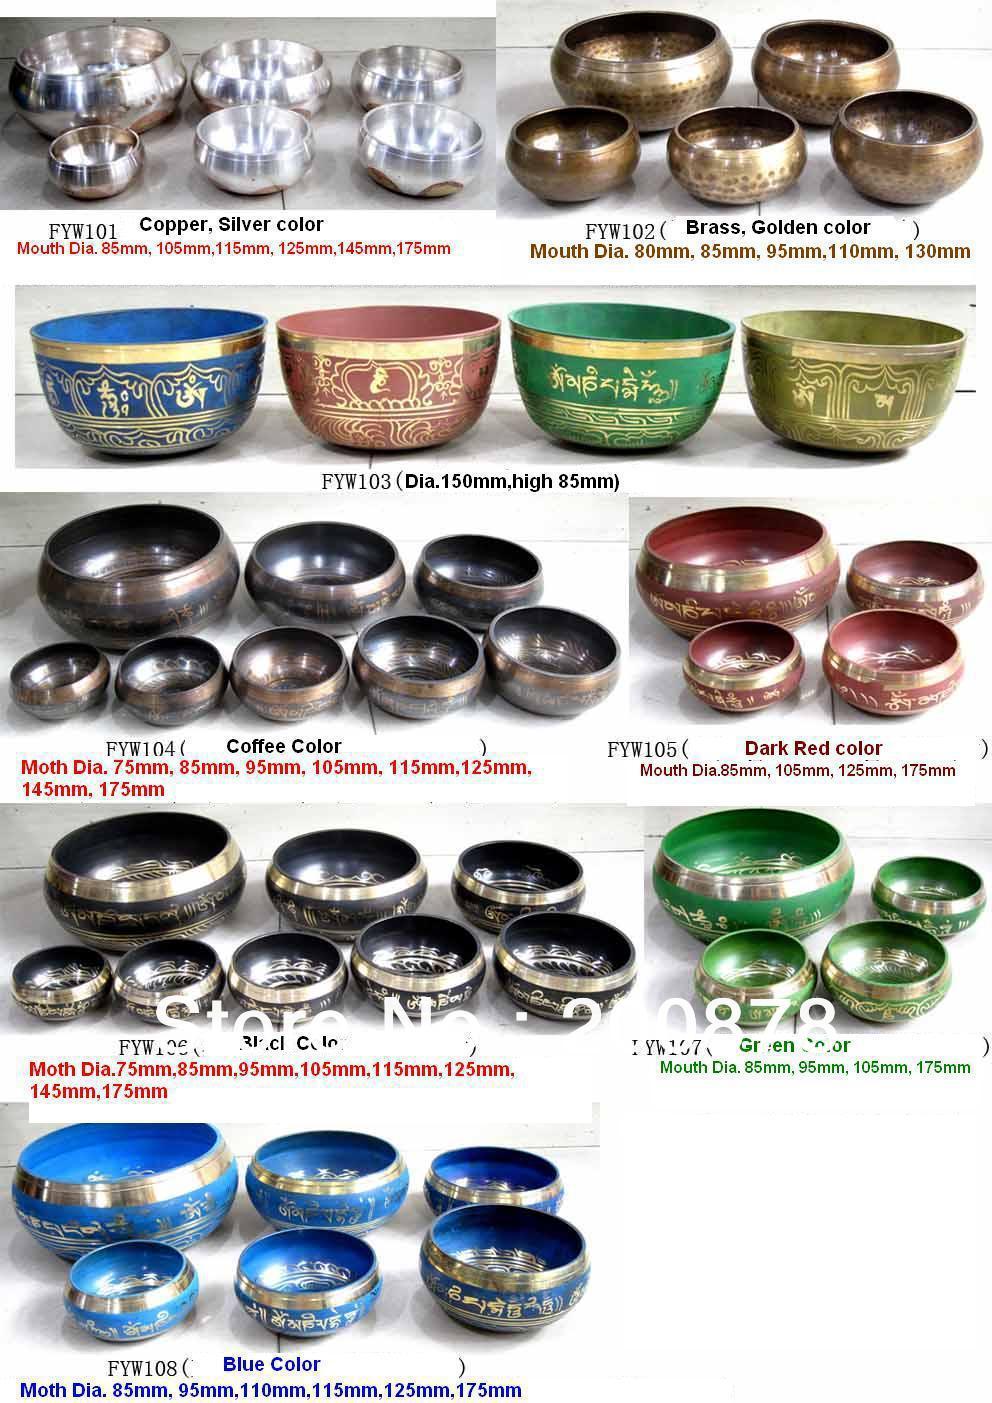 Mw 18 Whole Tibet Buddhist Singing Bowl Nepal White Metal Br Handicrafts Healing Bowls Mix Order Various Size